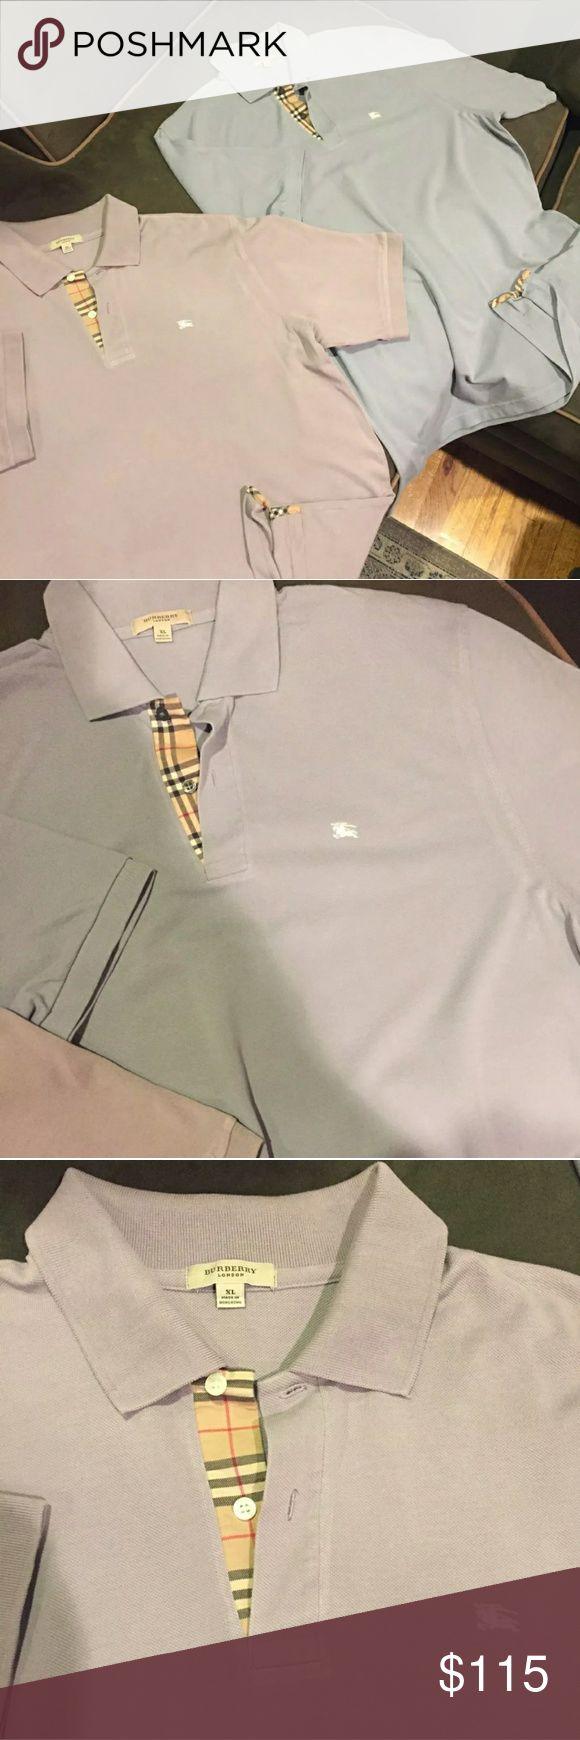 Burberry Polo Shirts Very very good. 2 Burberry polo shirts Burberry Shirts Polos